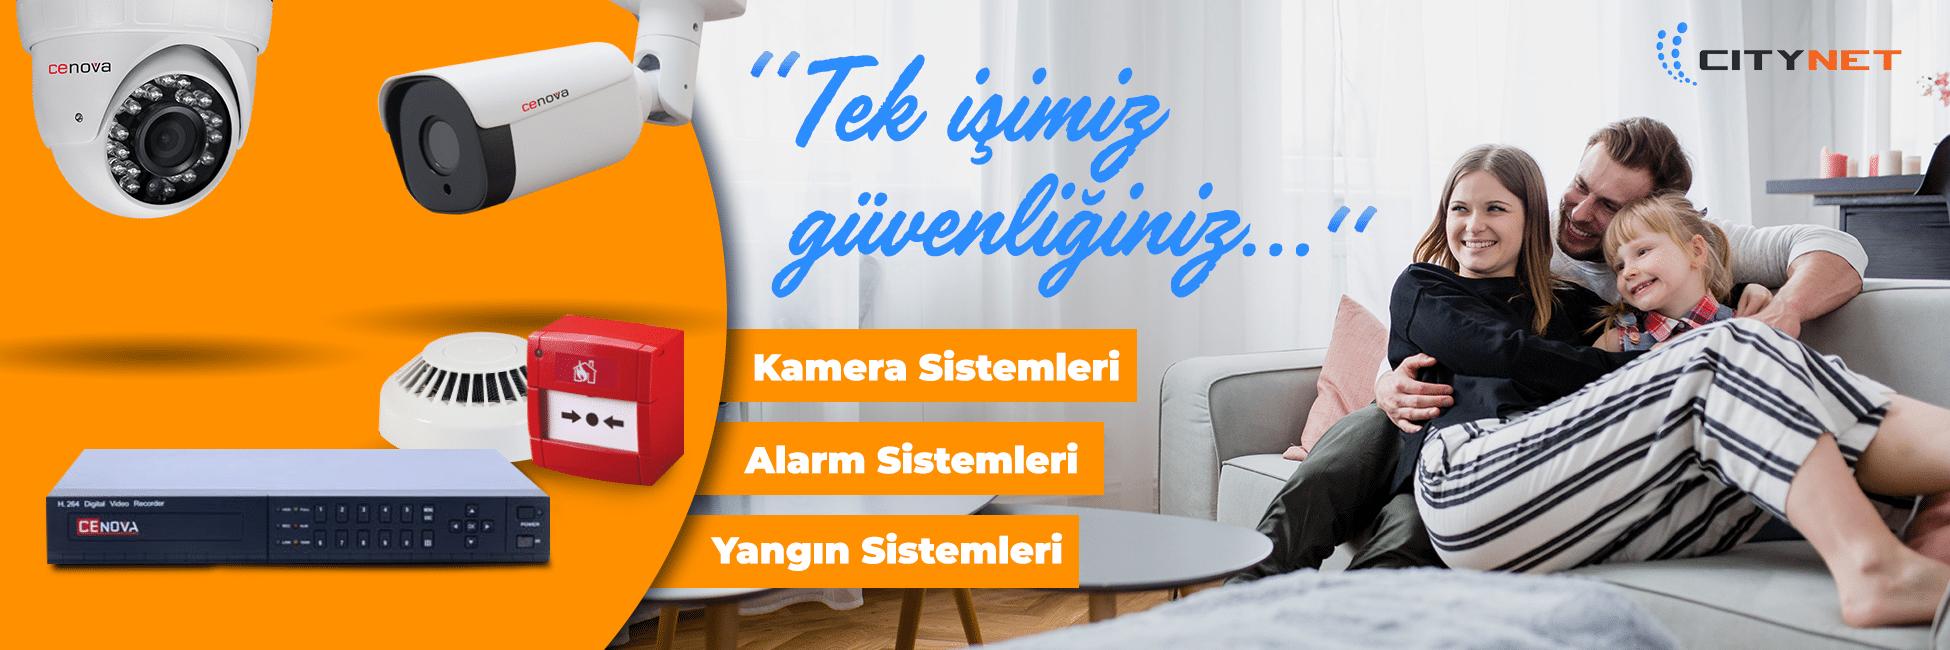 citynet-anasayfa-alarm-kamera